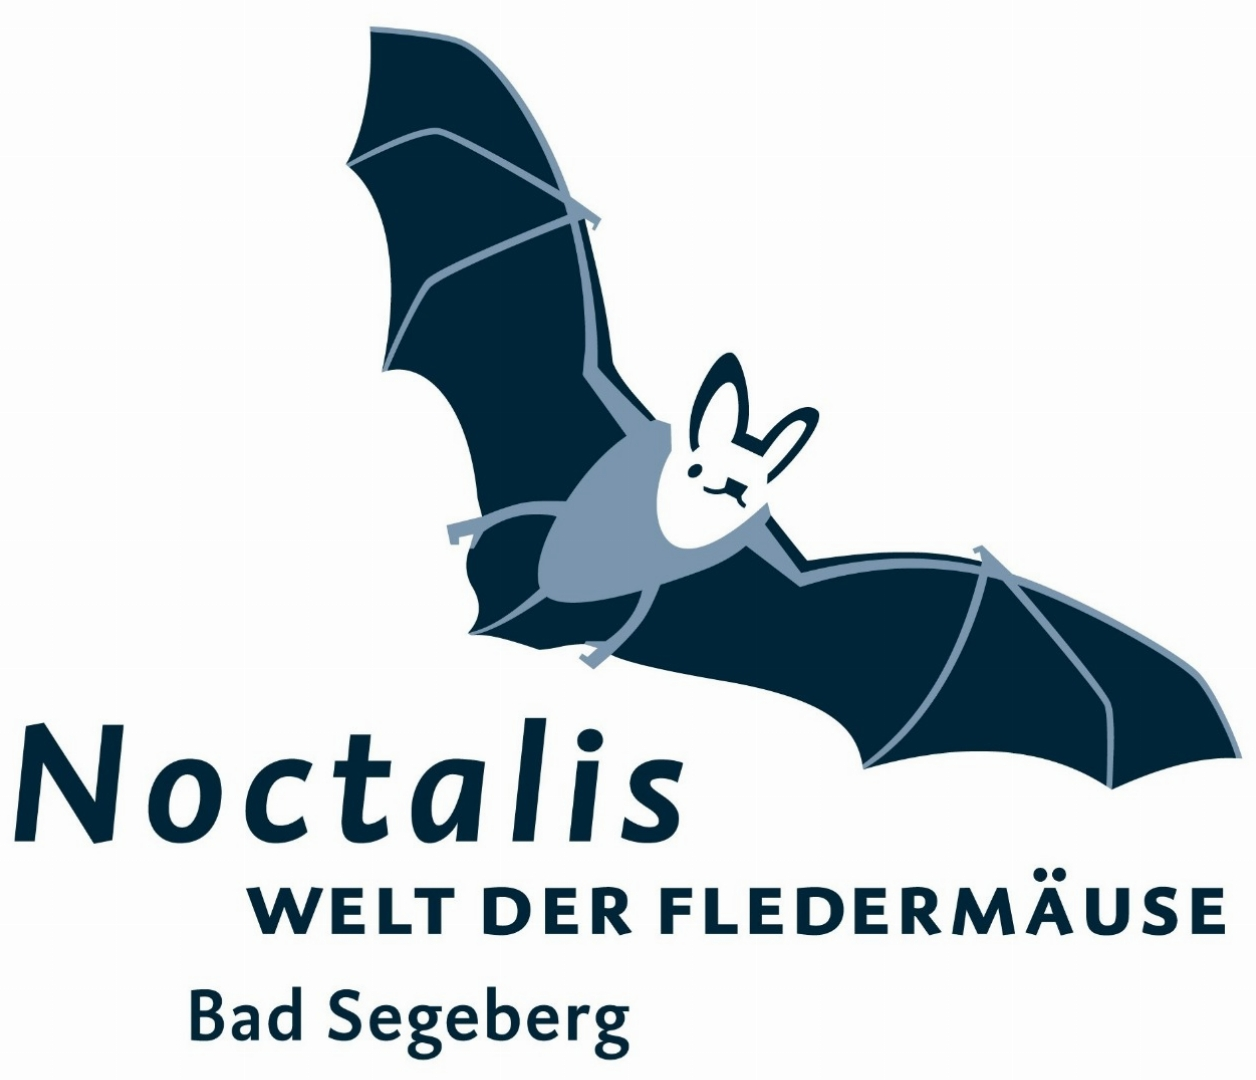 https://www.noctalis.de/de/